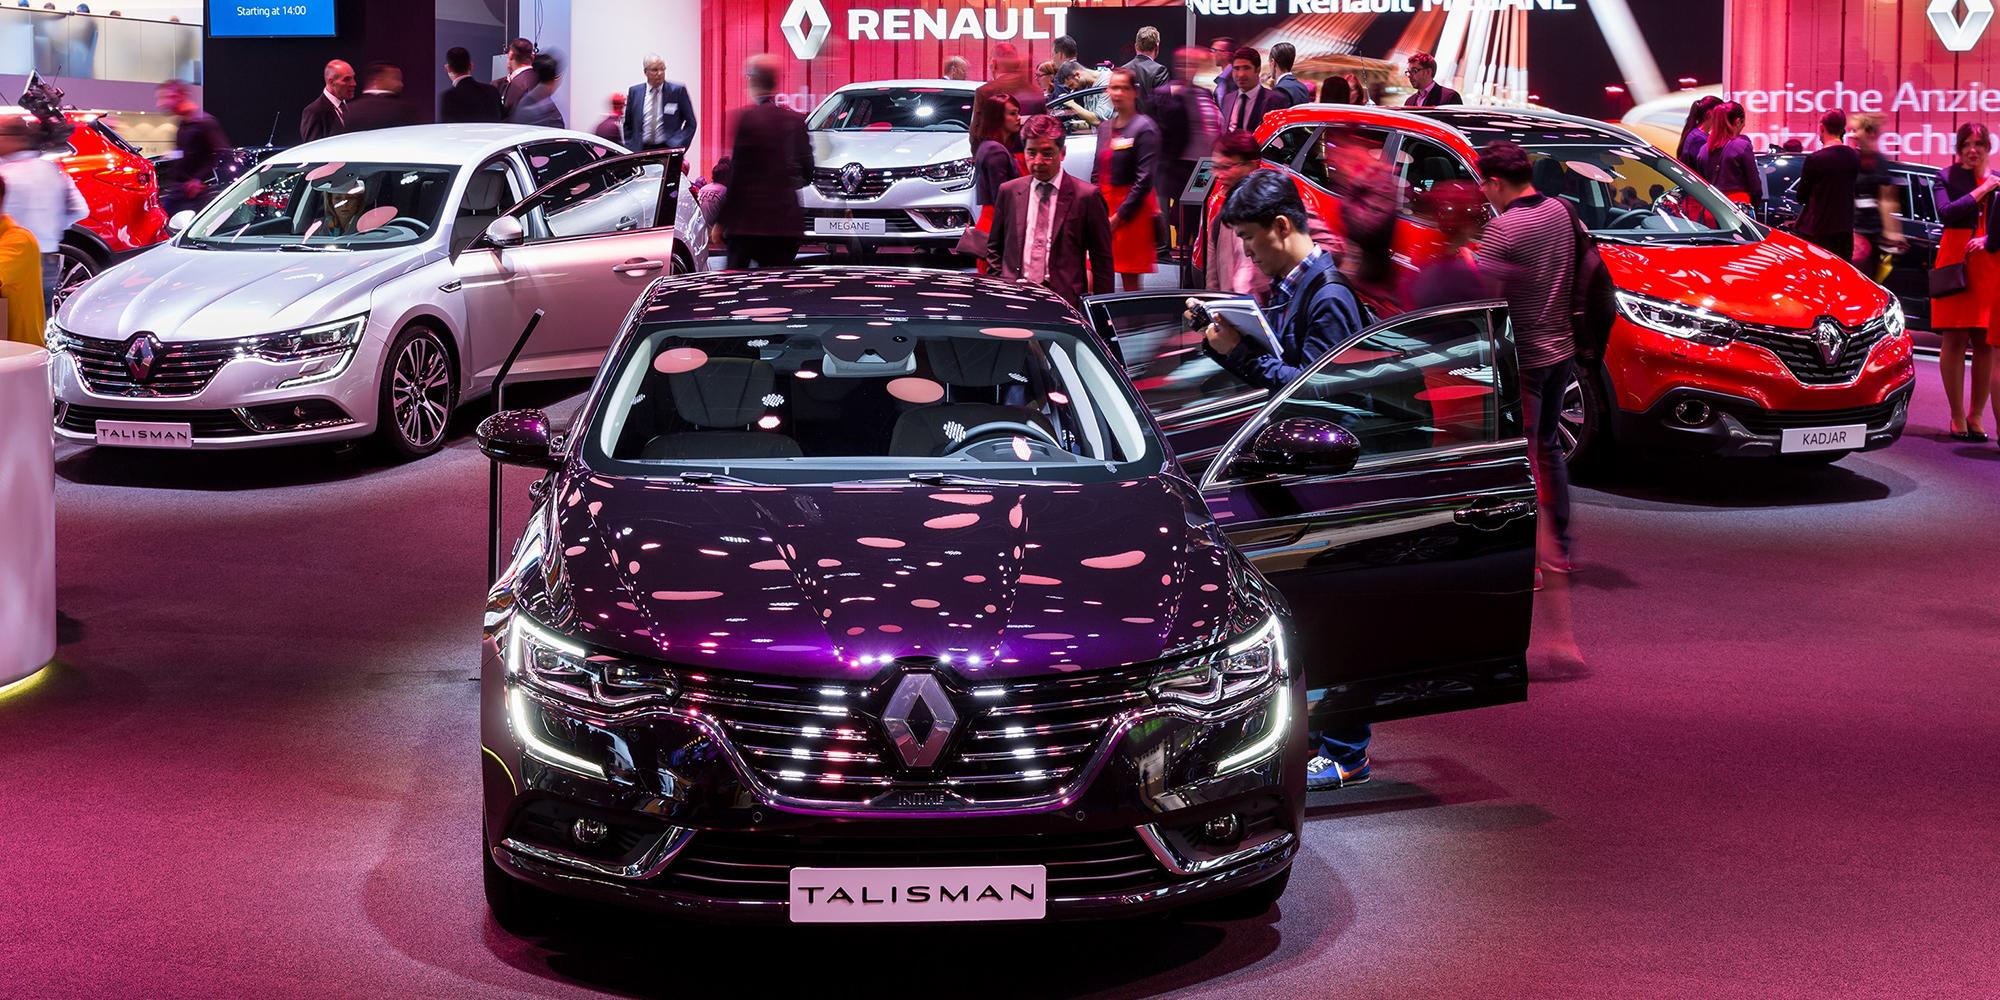 Tolle neue Modelle à la Renault: Talisman, Espace, Kadjar und Clio R.S. Trophy